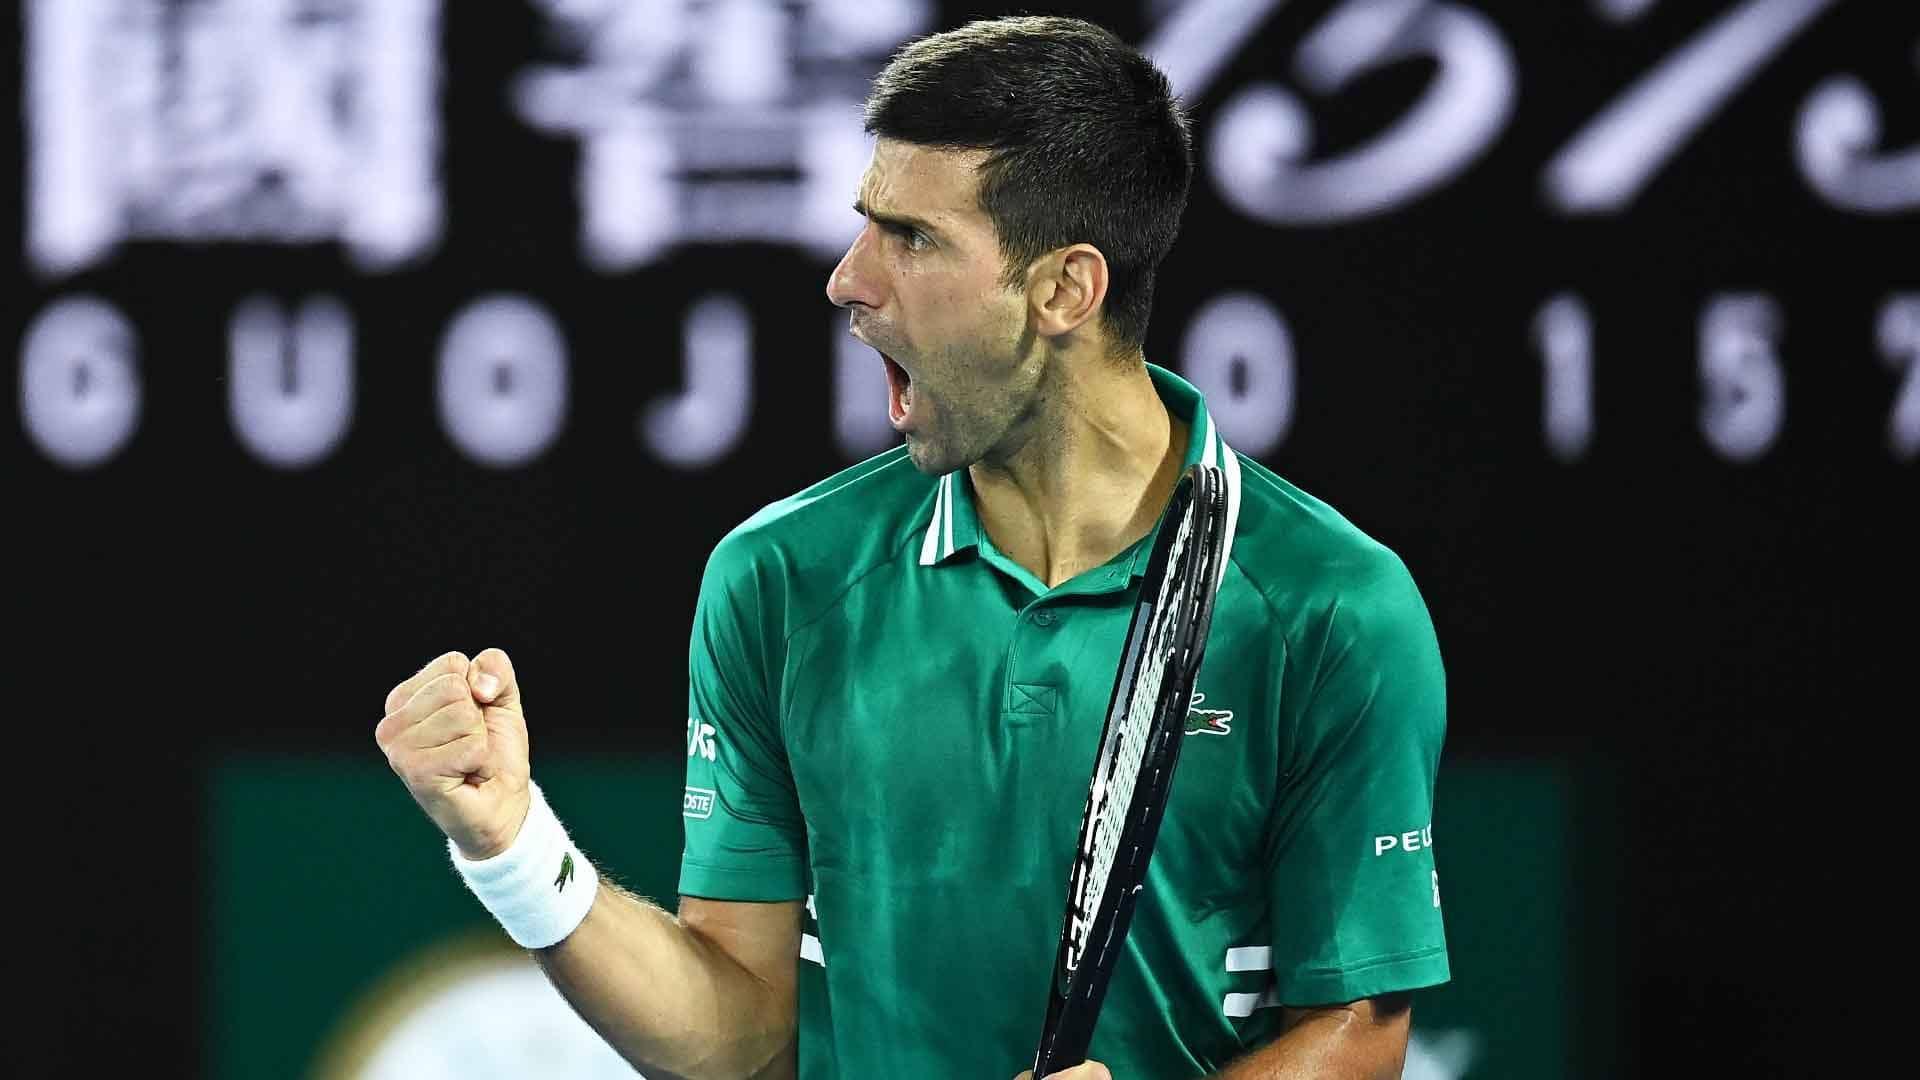 Djokovic Repeats Zverev Win, Reaches Ninth Australian Open Semi-final - ATP Tour